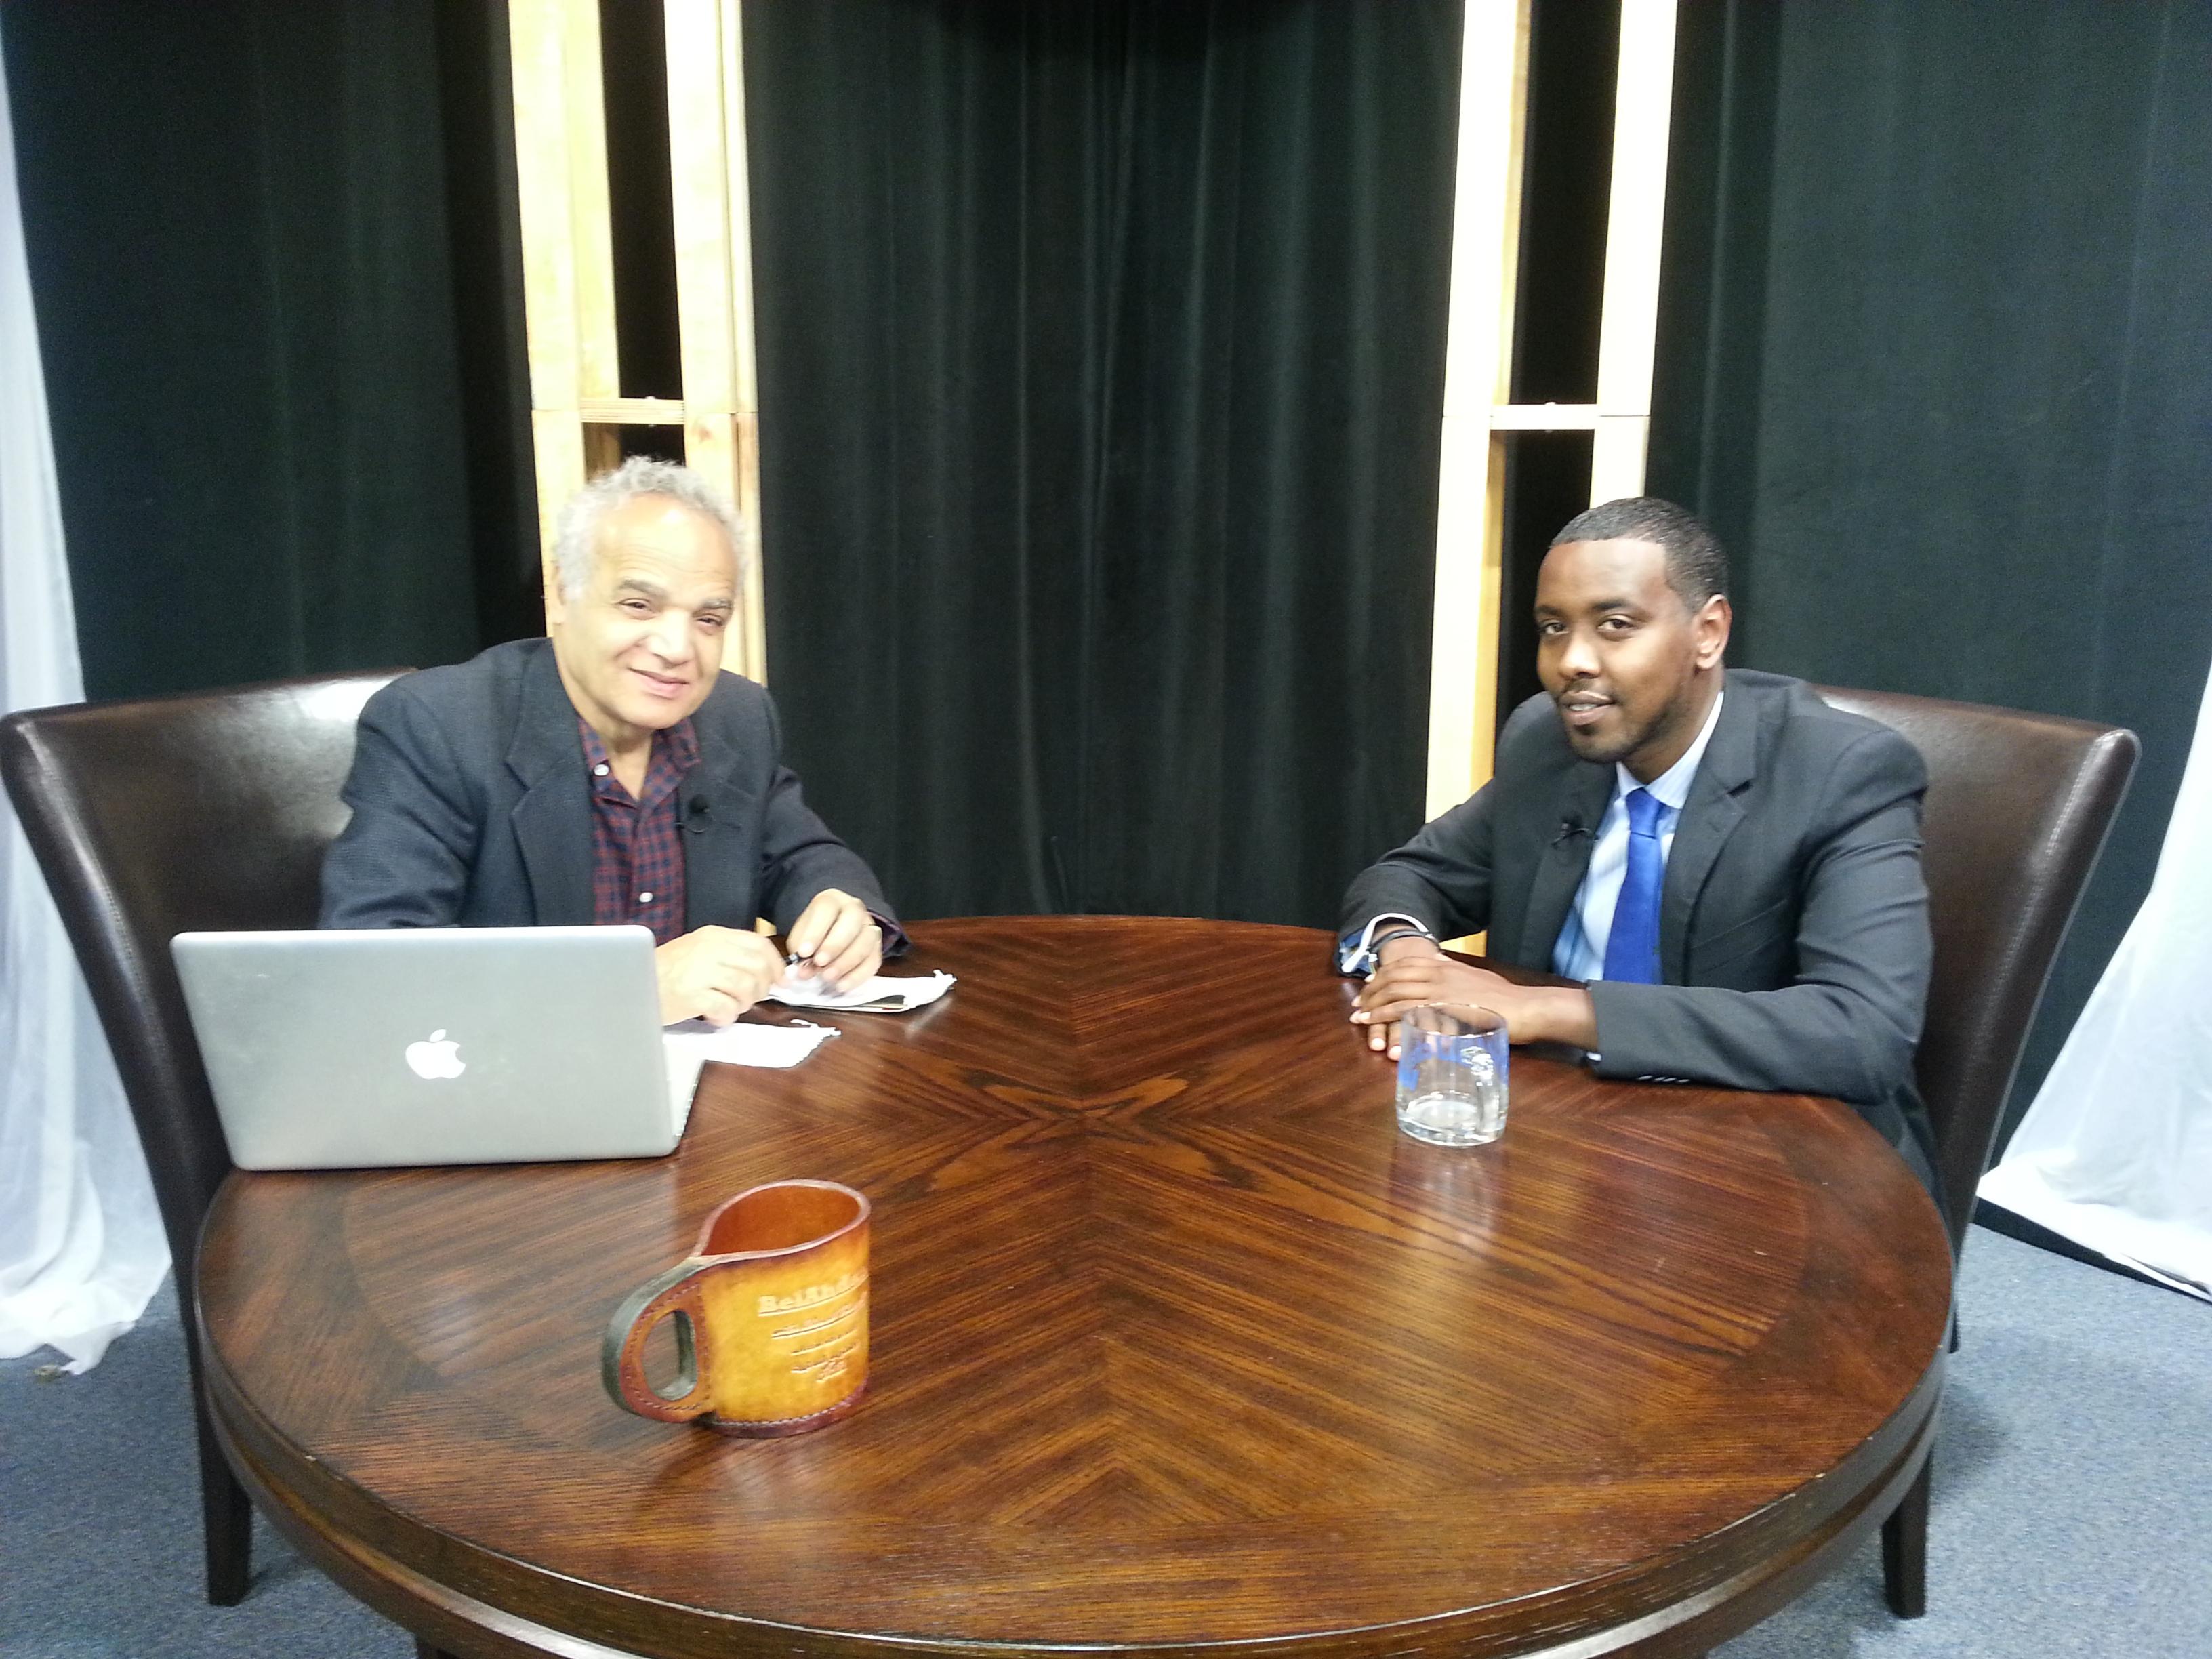 BelAhdan with Abdi Warsame, Somali political clout